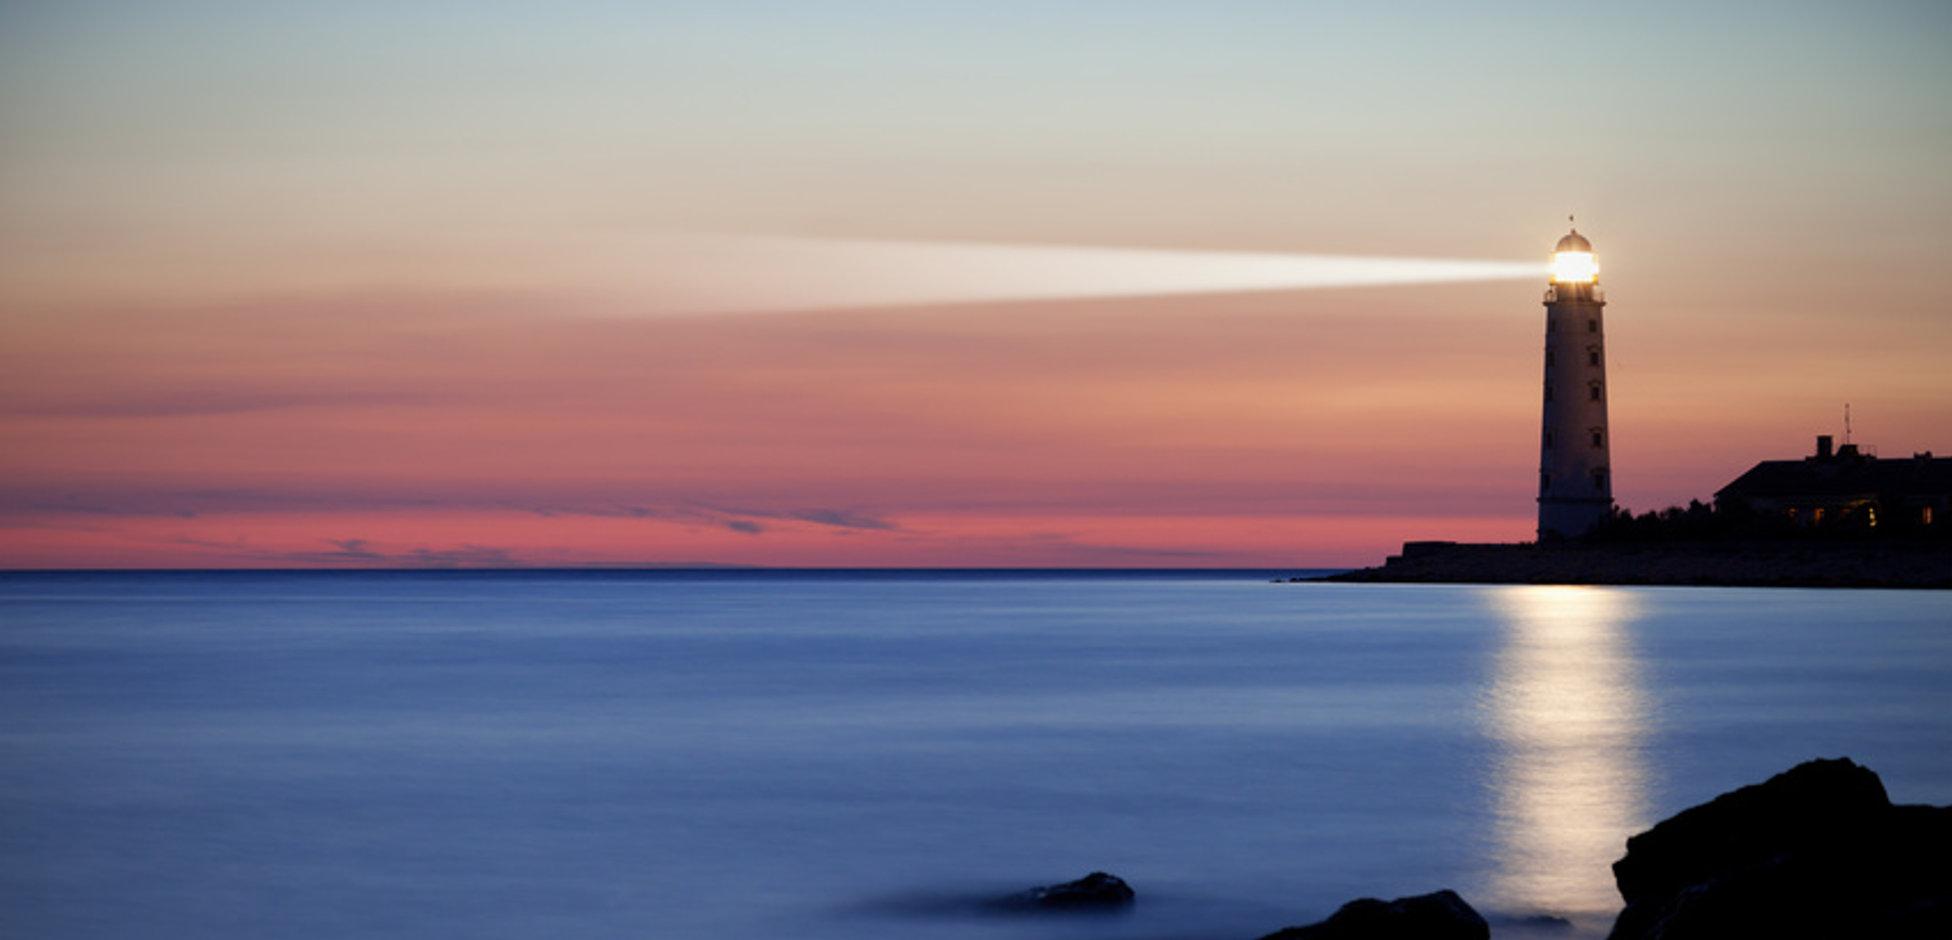 Seascape at sunset. Lighthouse on the coast